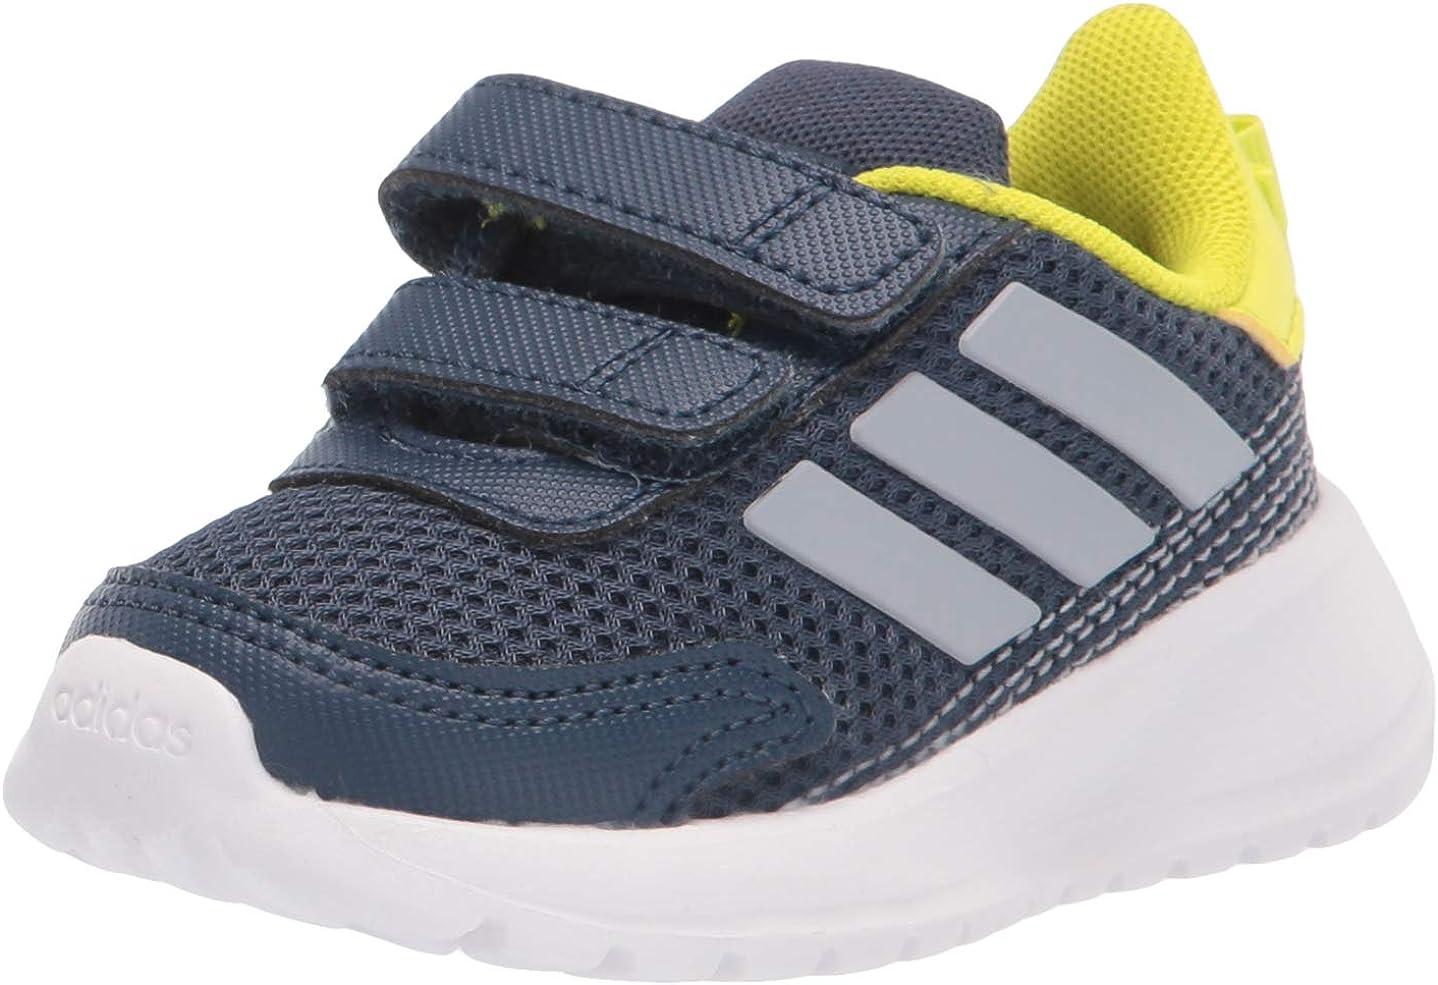 adidas Unisex-Child Many popular brands Tensaur Running Shoe Superior